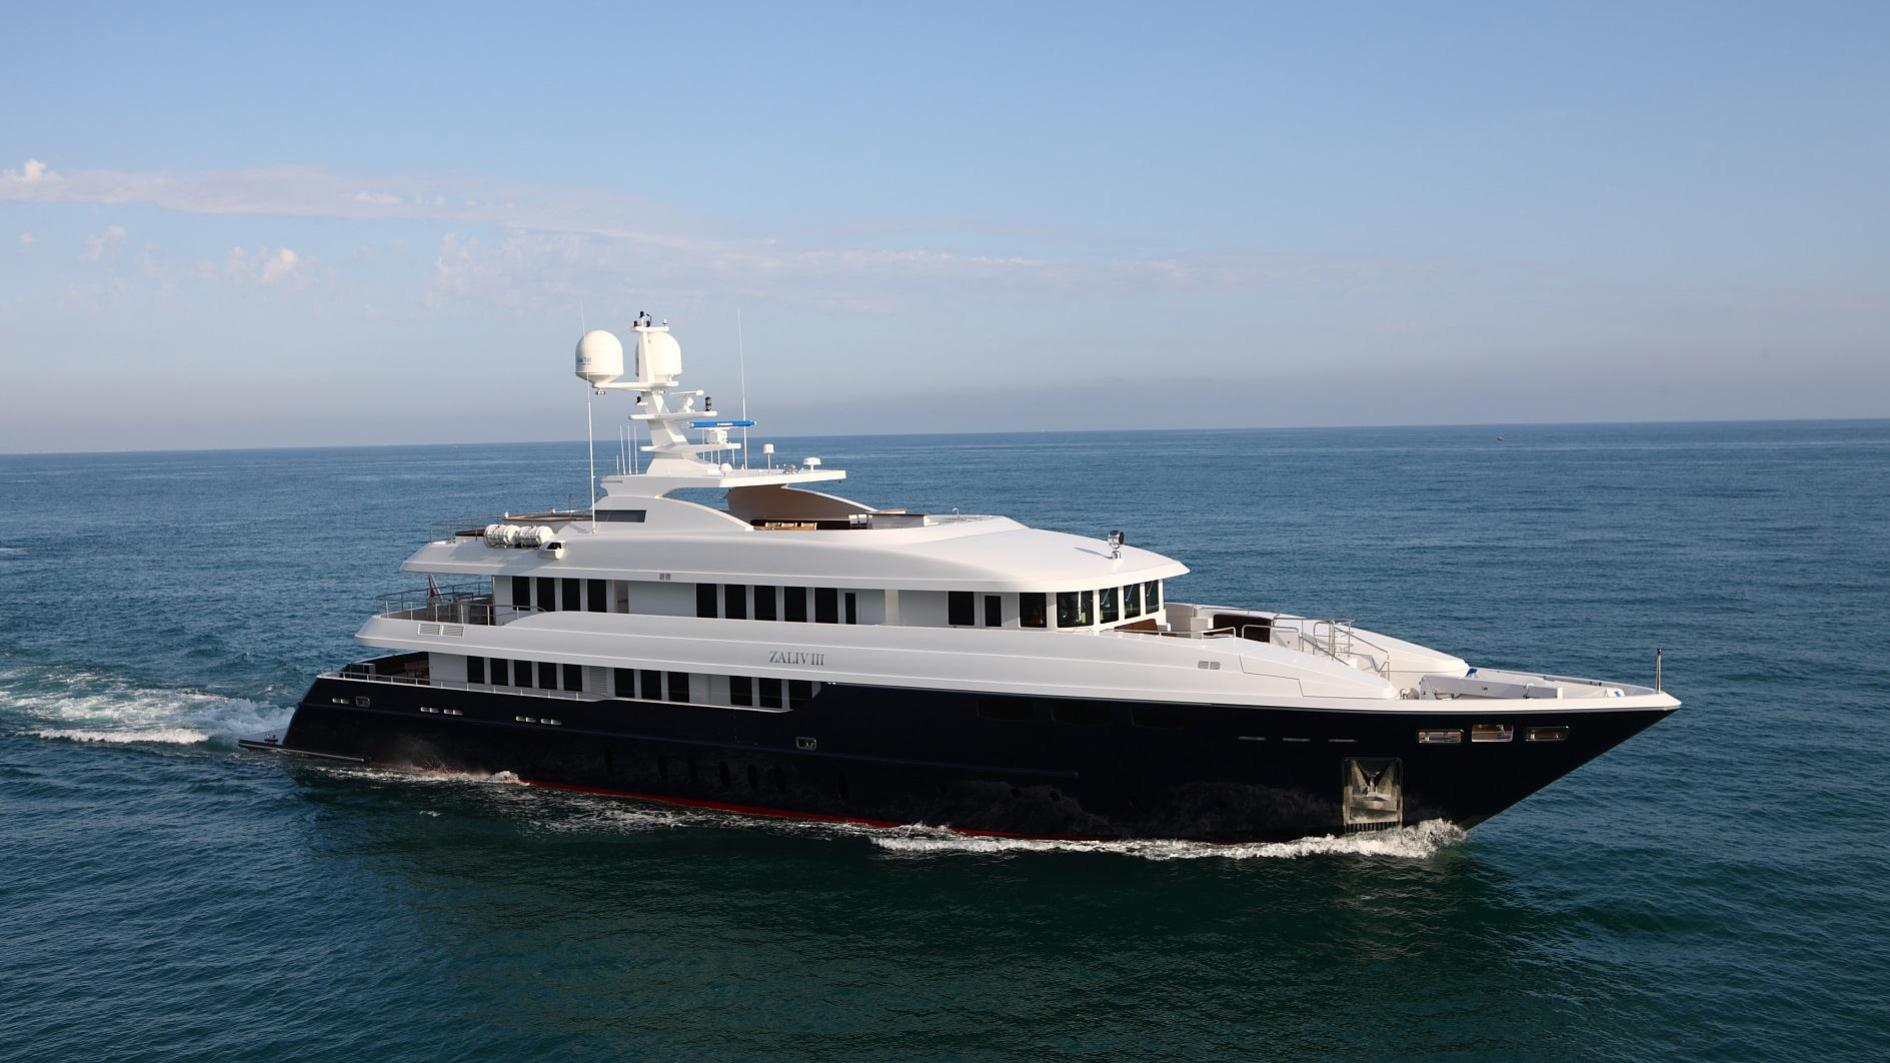 zaliv-iii-yacht-for-sale-profile